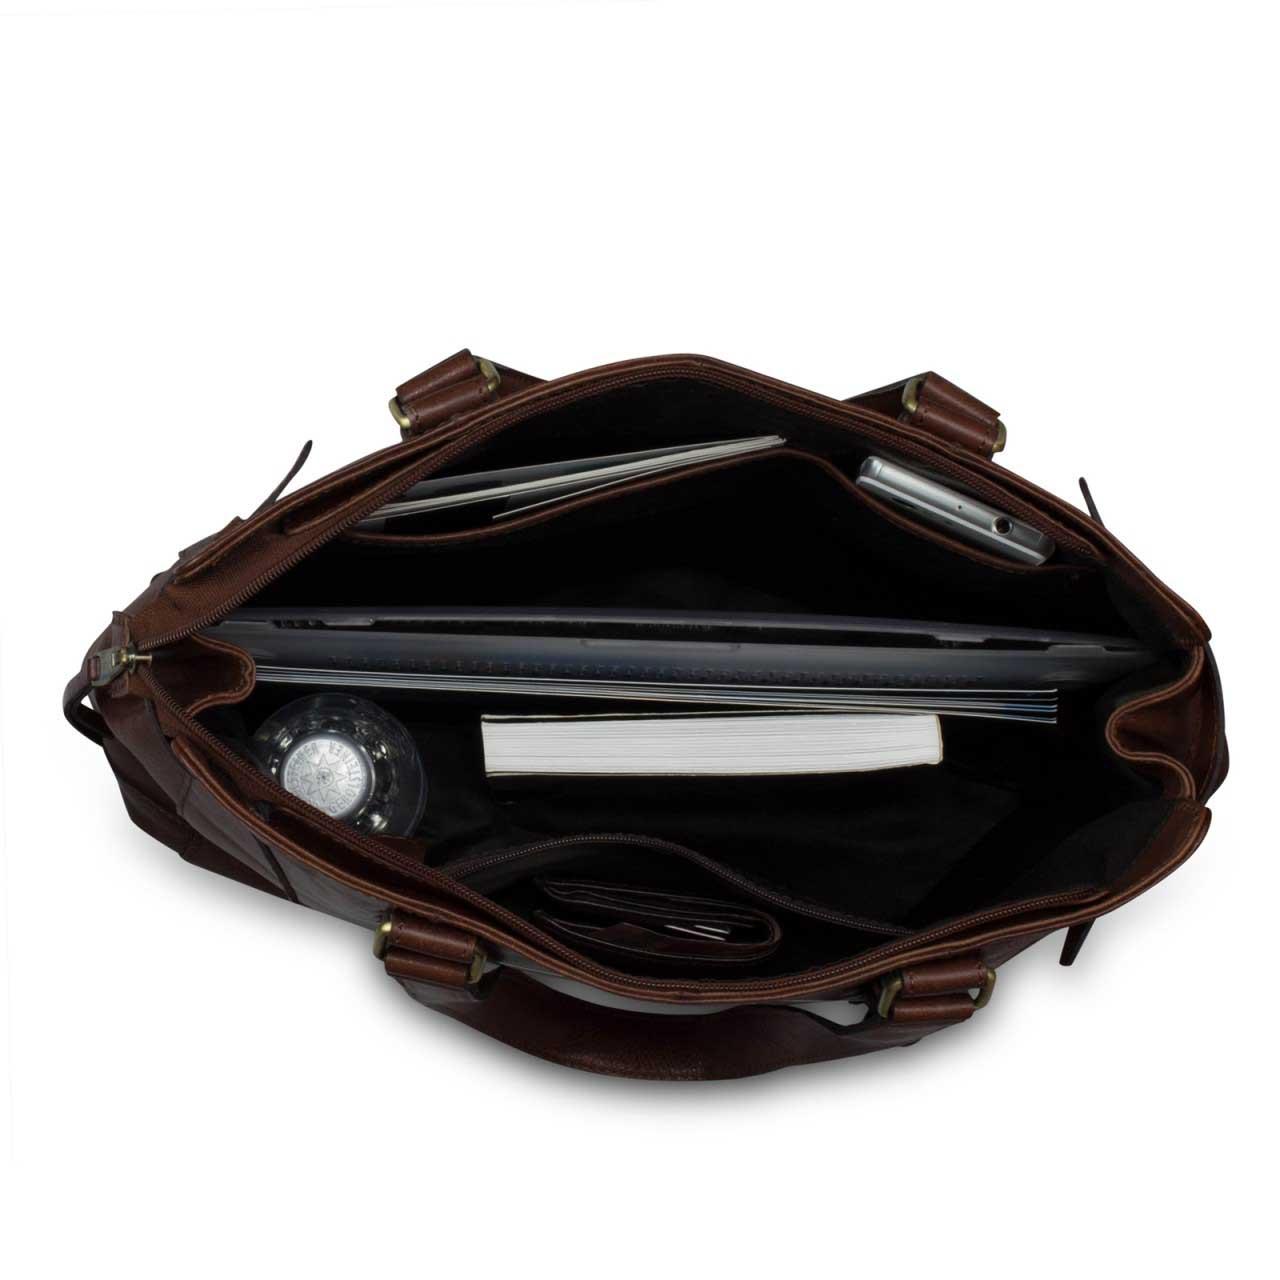 STILORD Große Damenhandtasche Leder 34 x 35 x 9 cm dunkelbraun - Bild 5